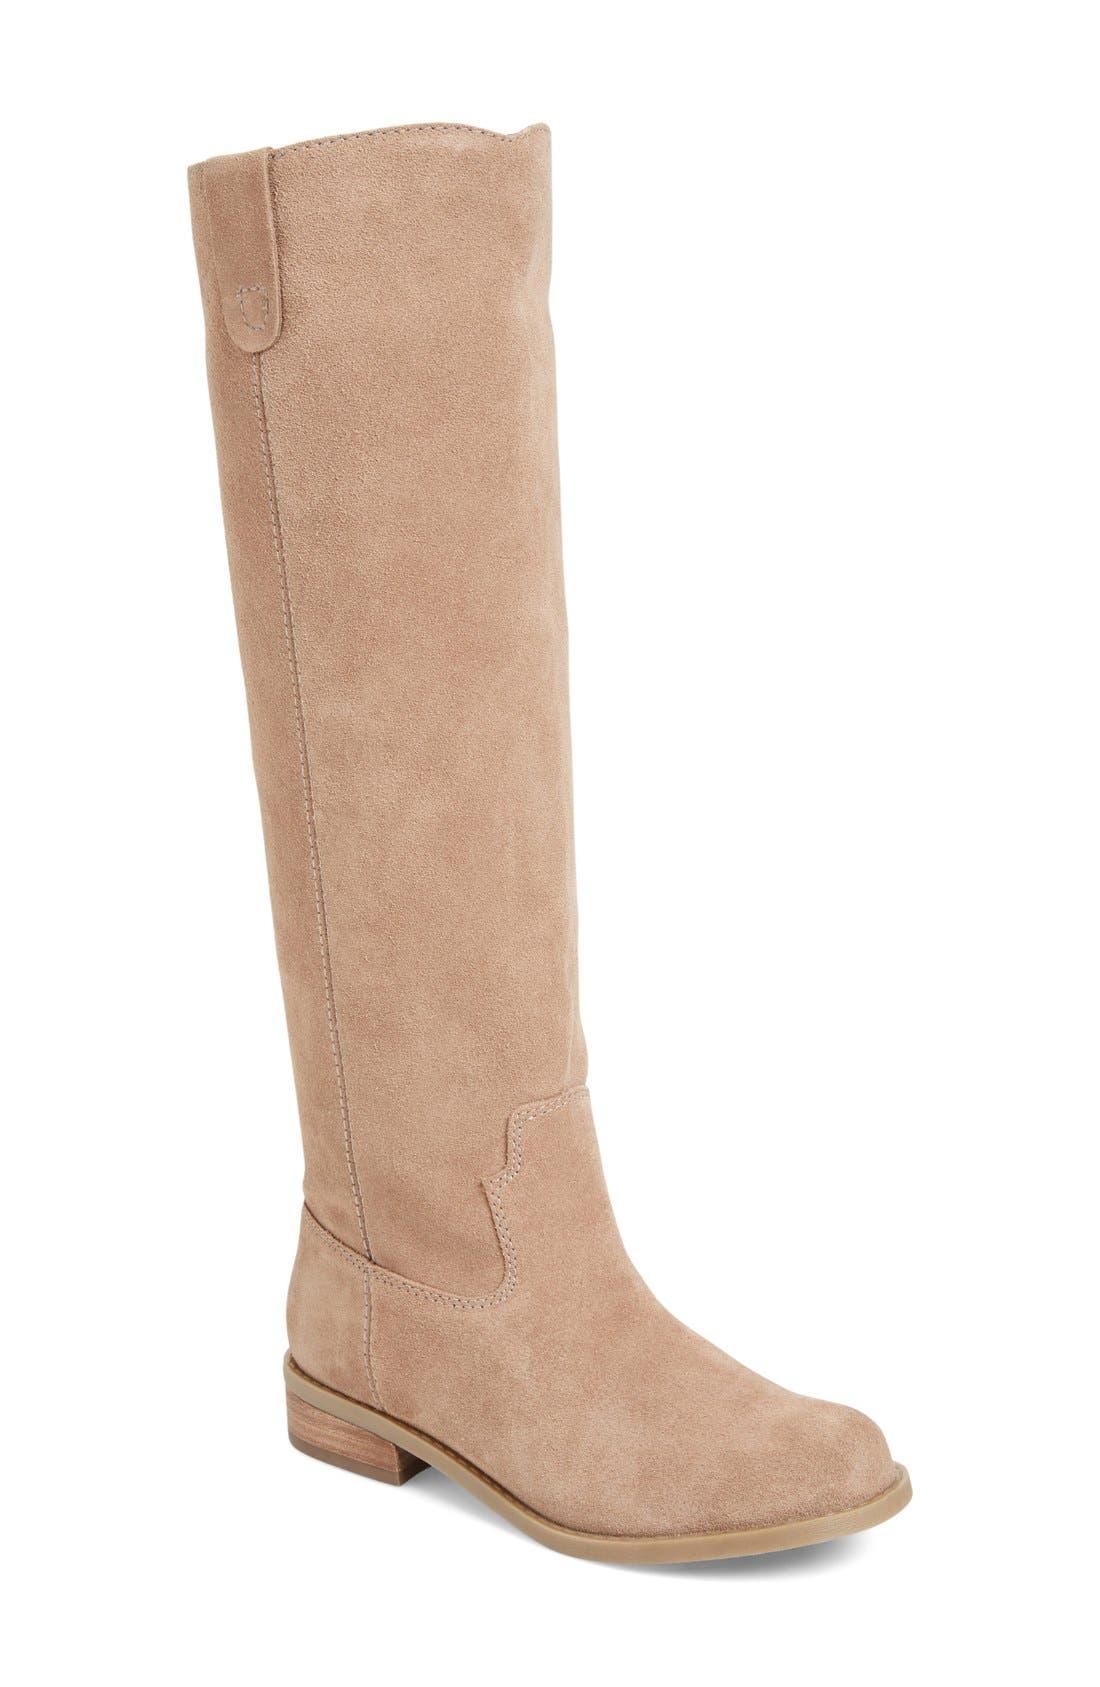 Main Image - Sole Society Hawn Knee High Boot (Women)